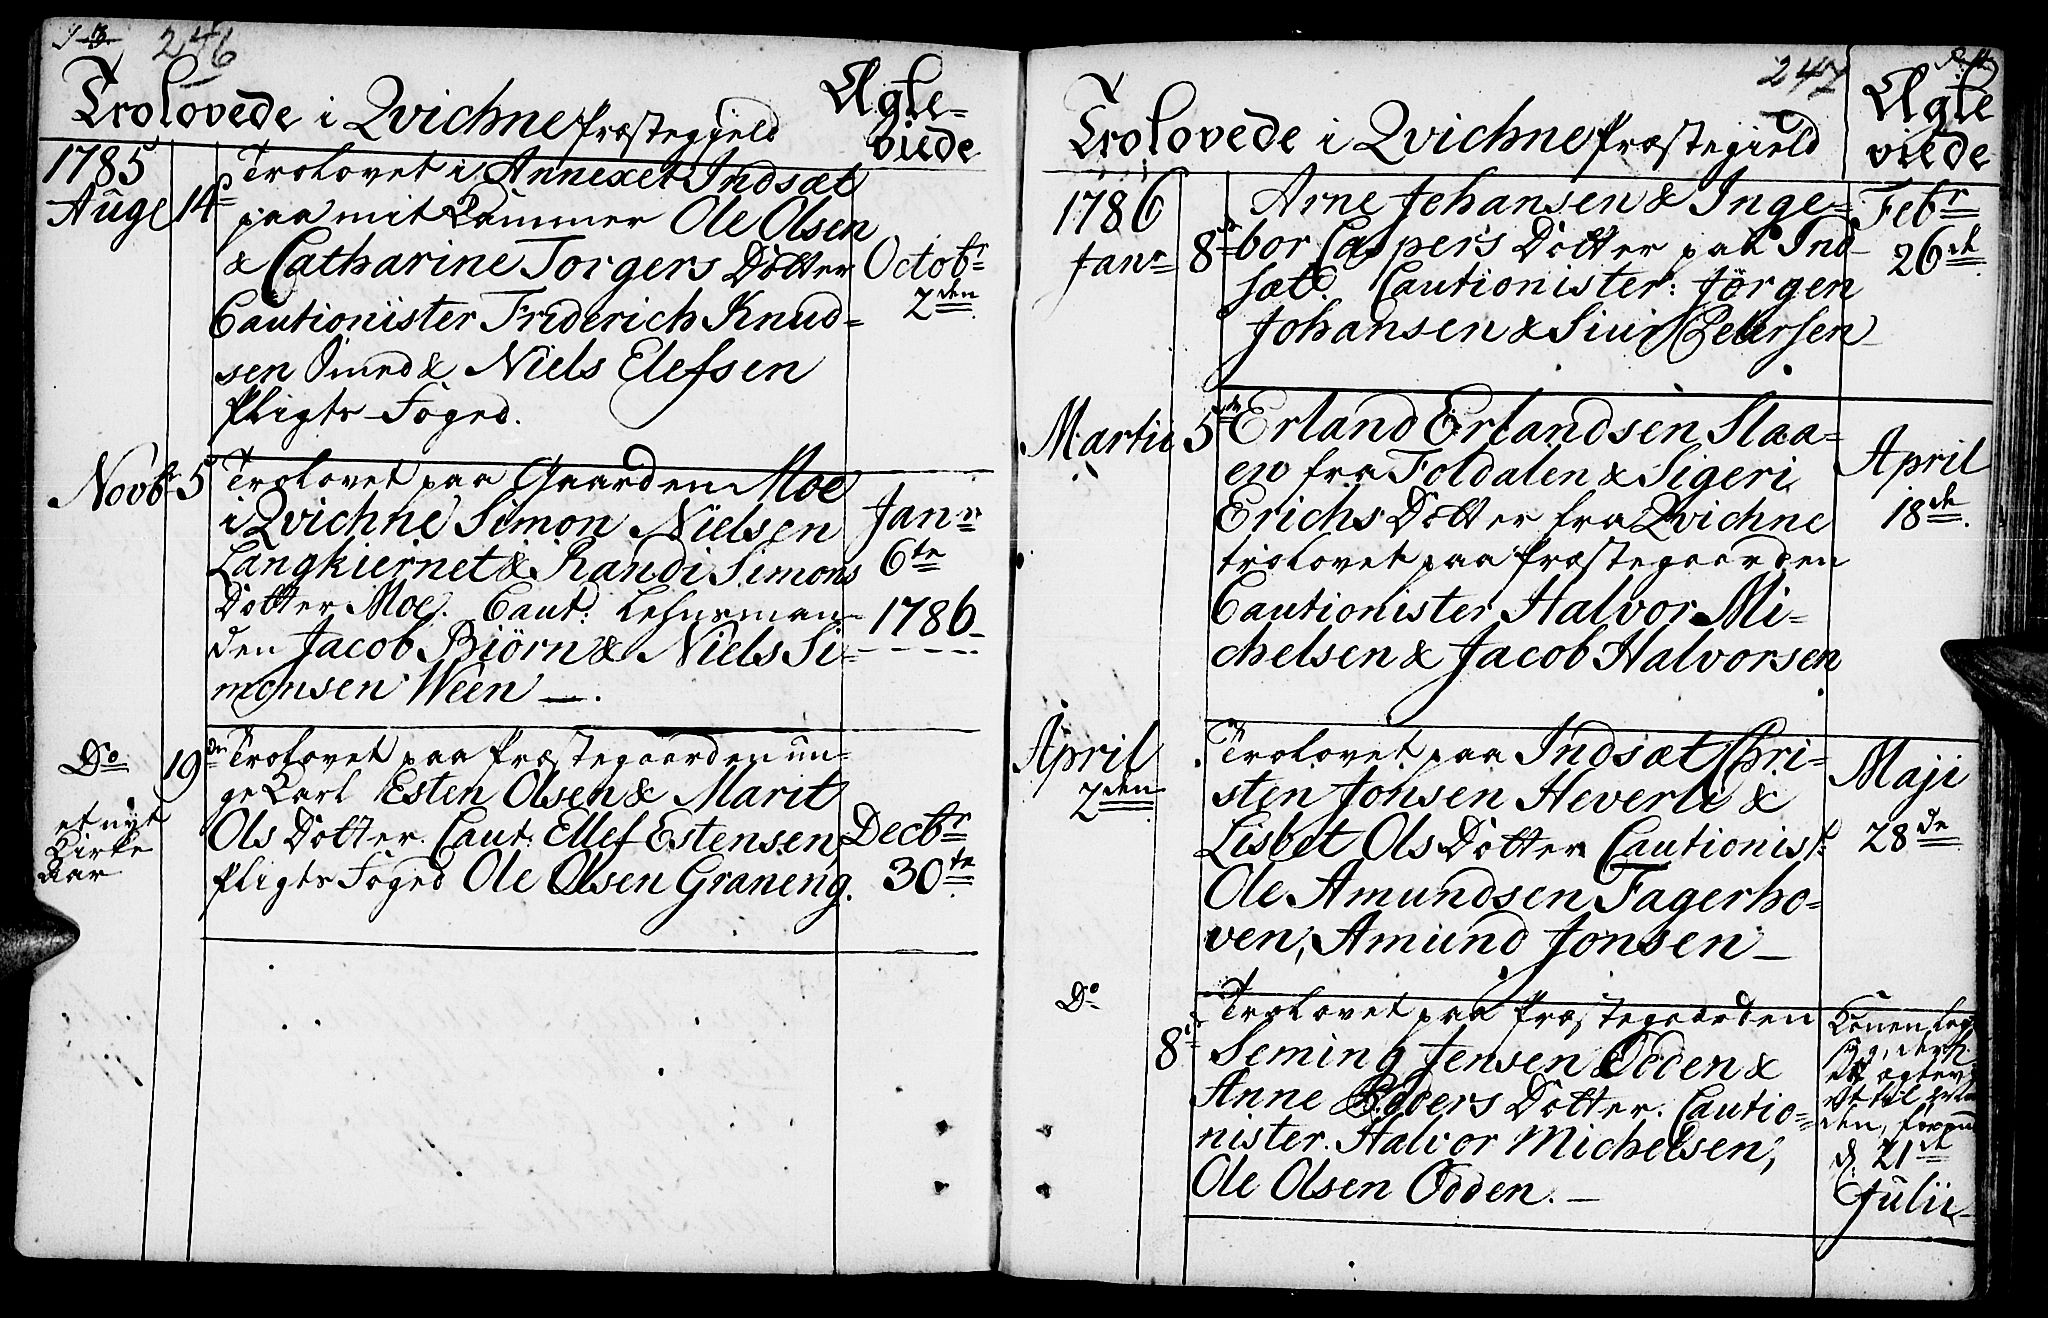 SAH, Kvikne prestekontor, Ministerialbok nr. 3, 1785-1814, s. 246-247